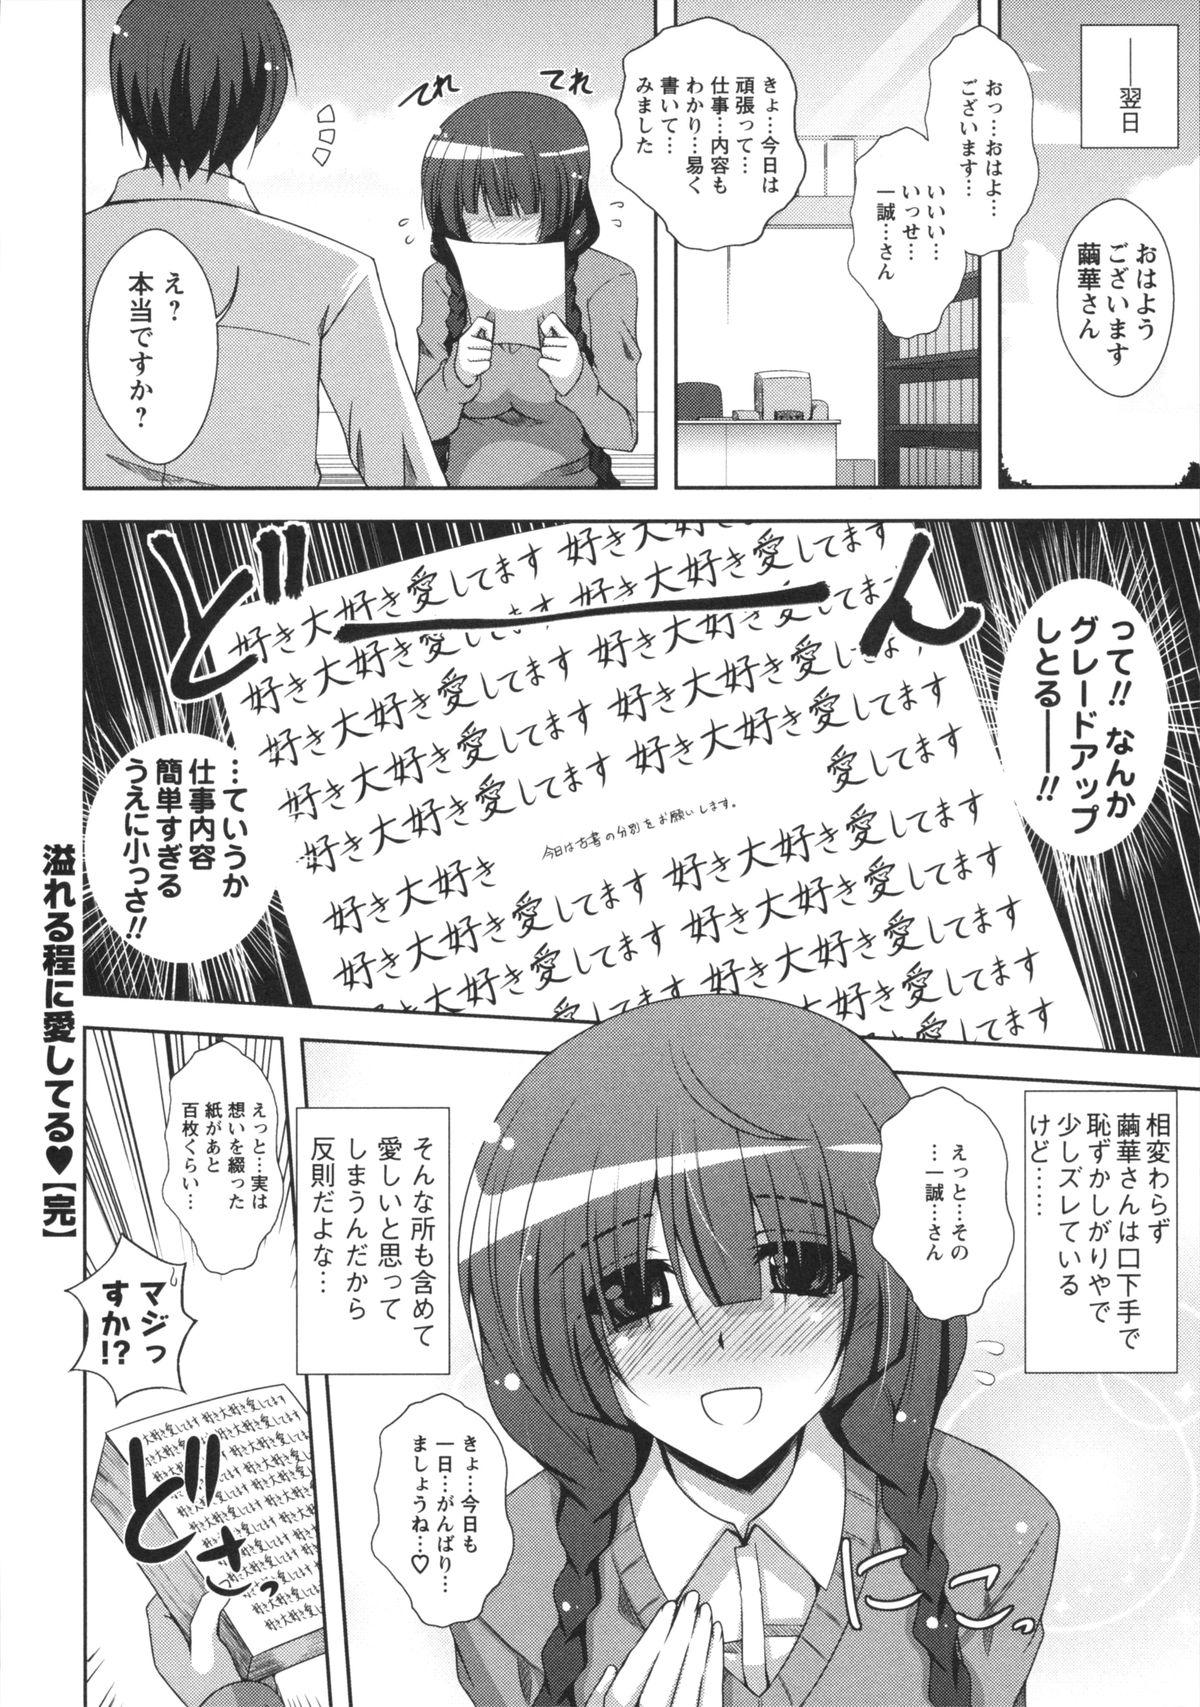 Binkan Niku Kanojyo 161